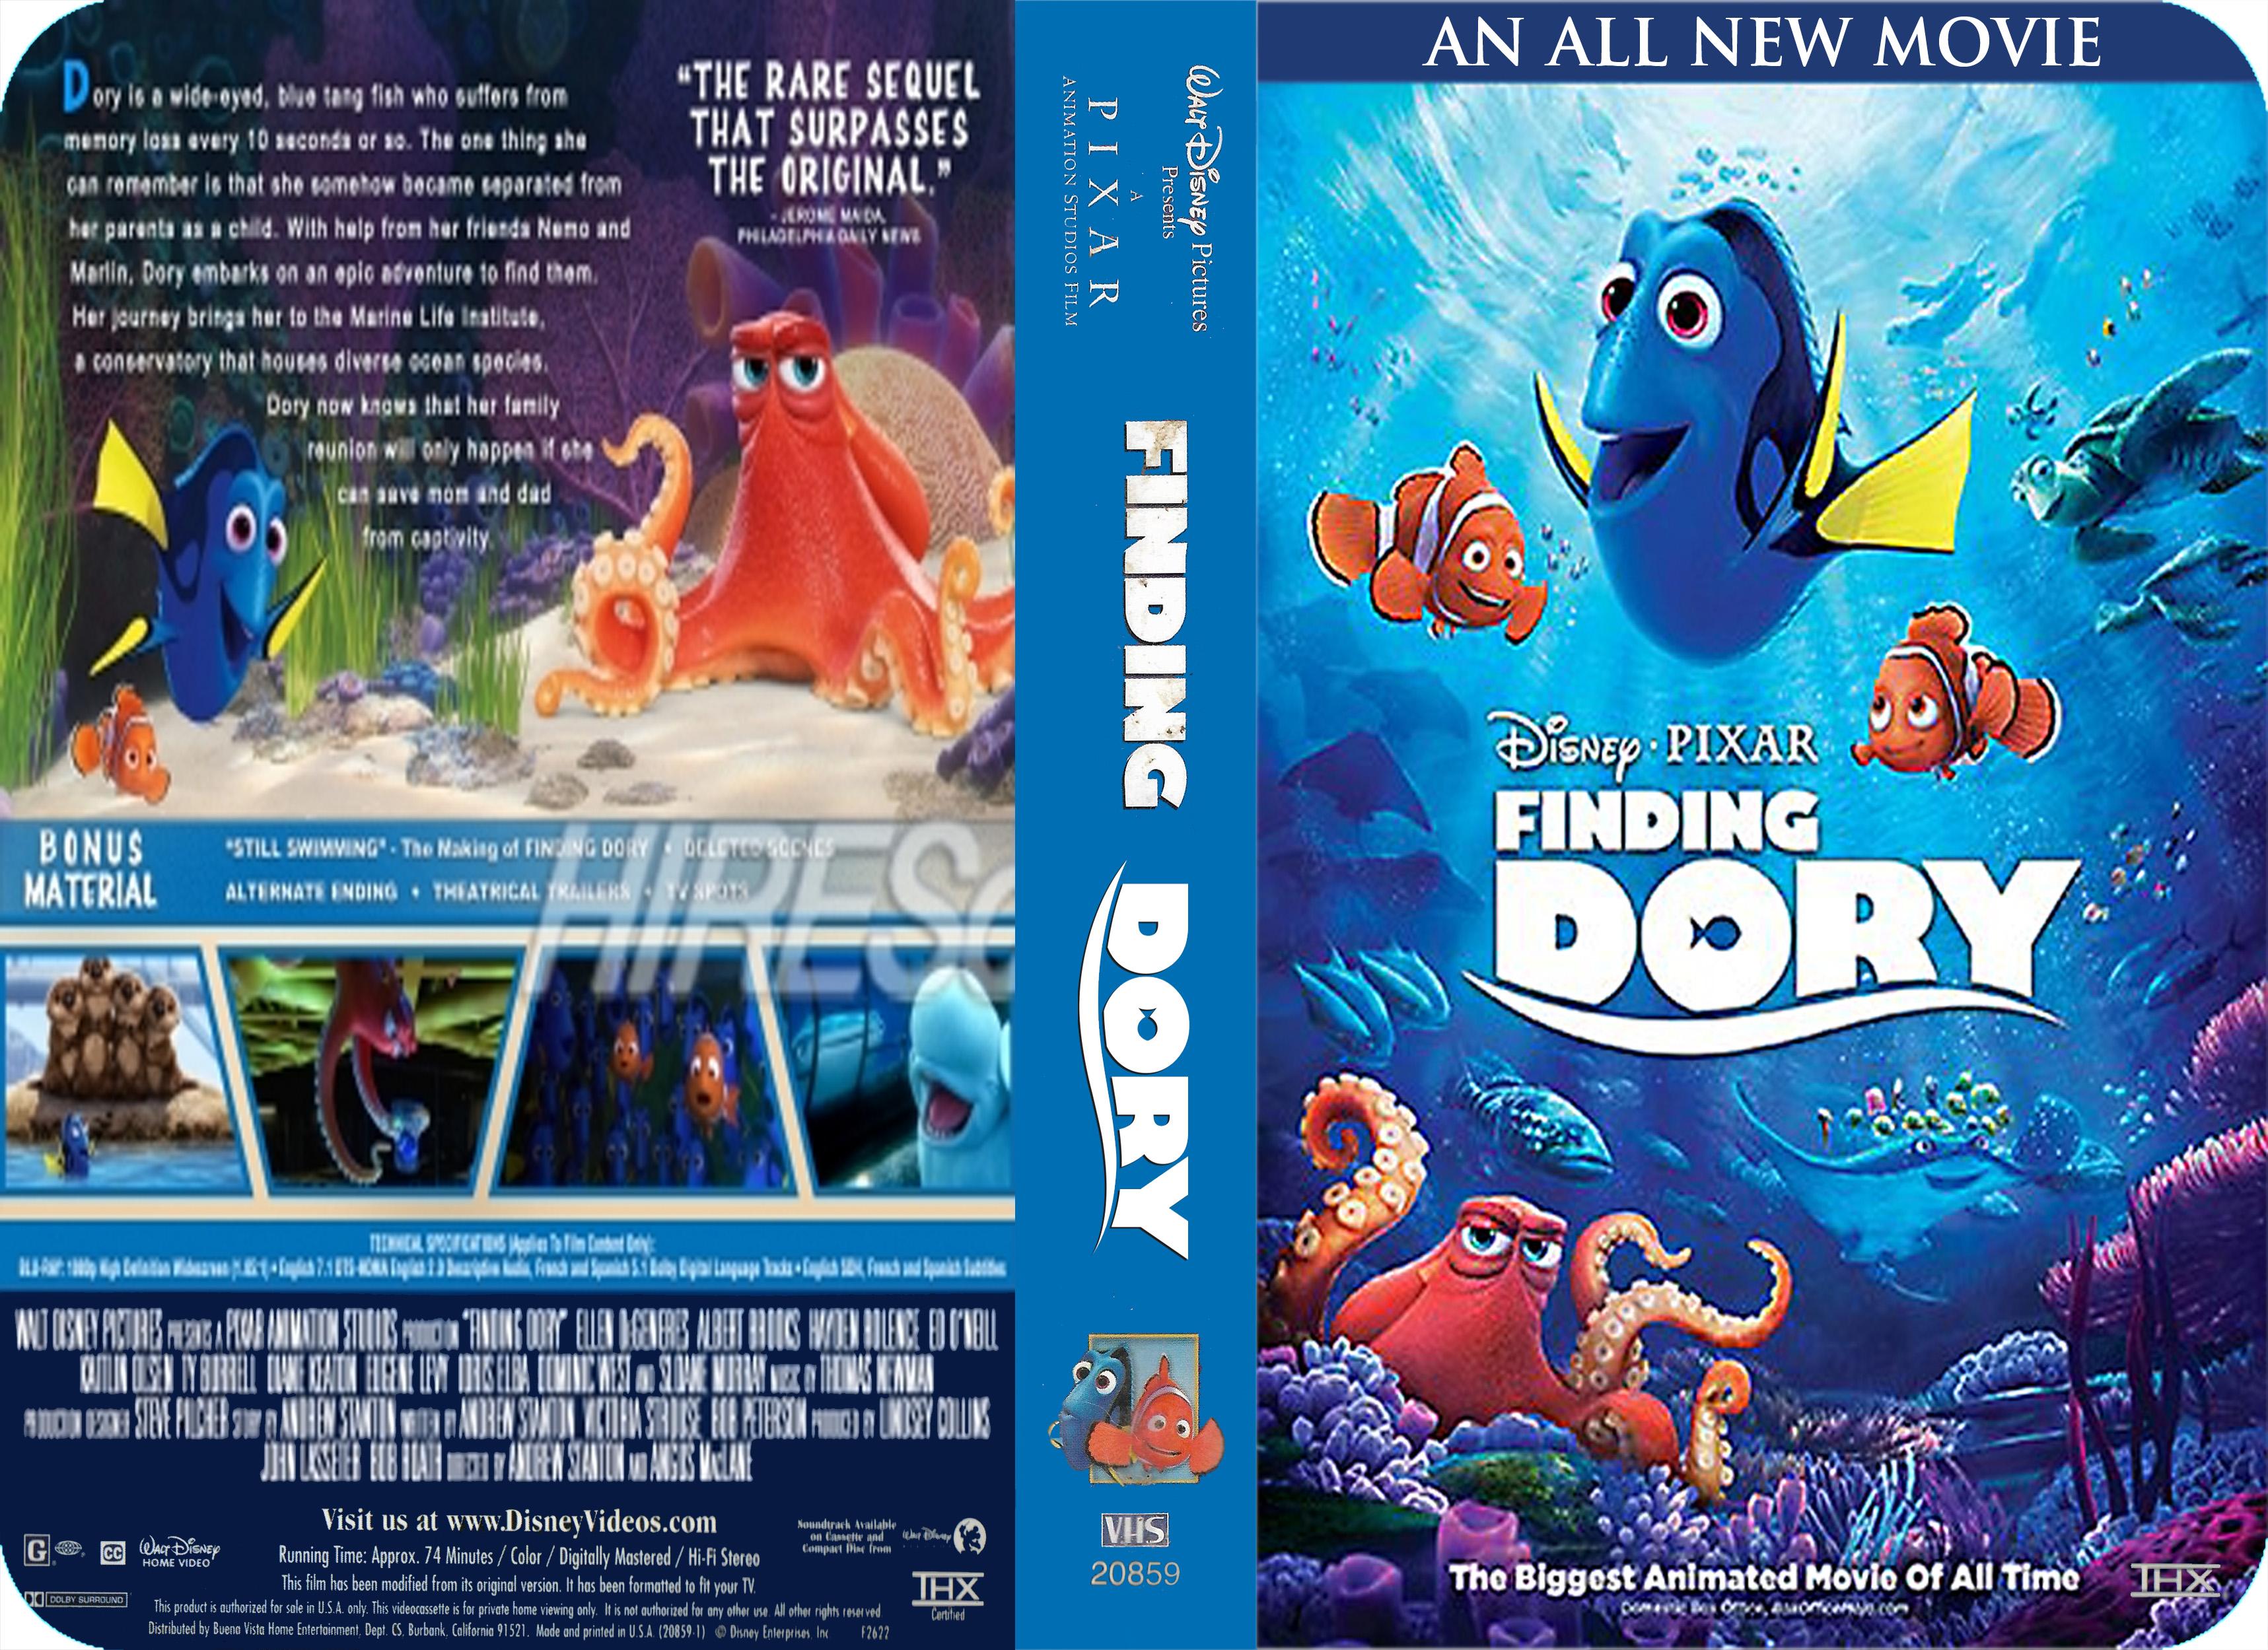 Disney•Pixar's Finding Dory (2003) VHS